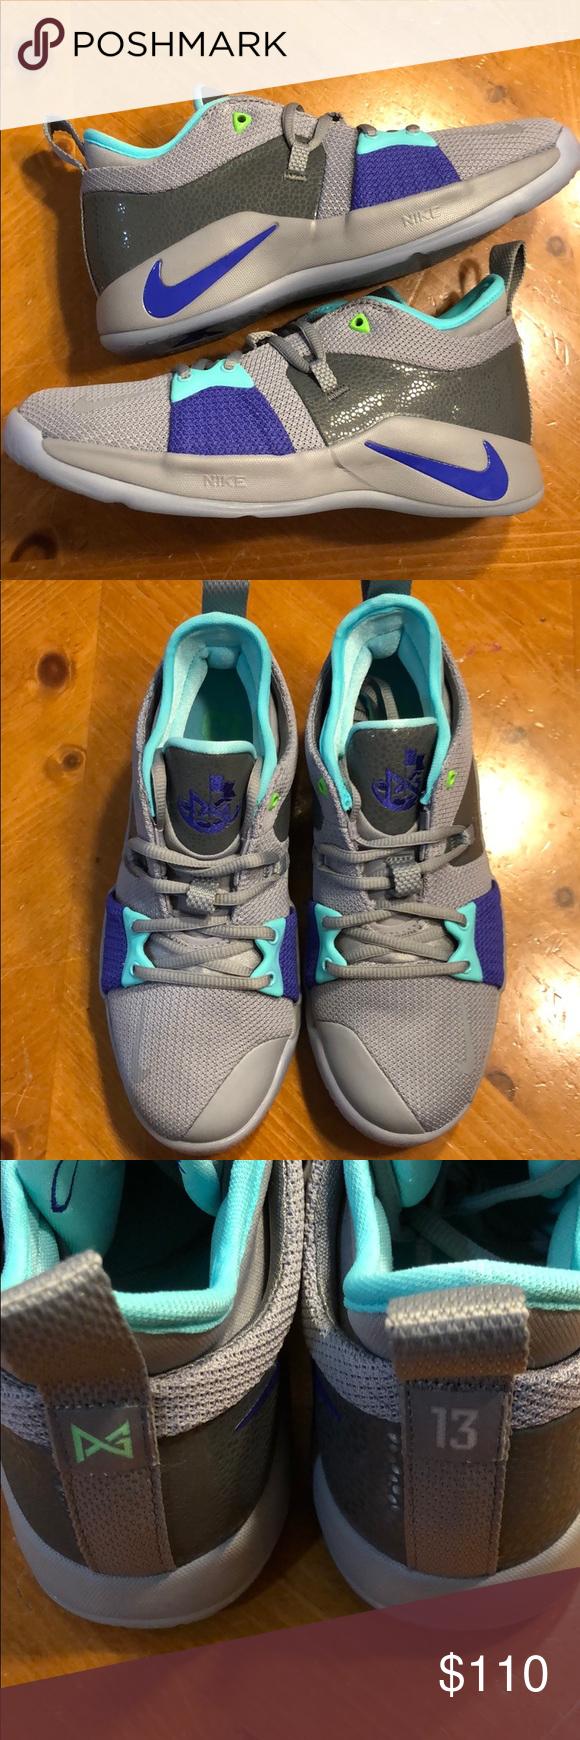 Nike PG 2 Safari GS Size 5.5Y NEW